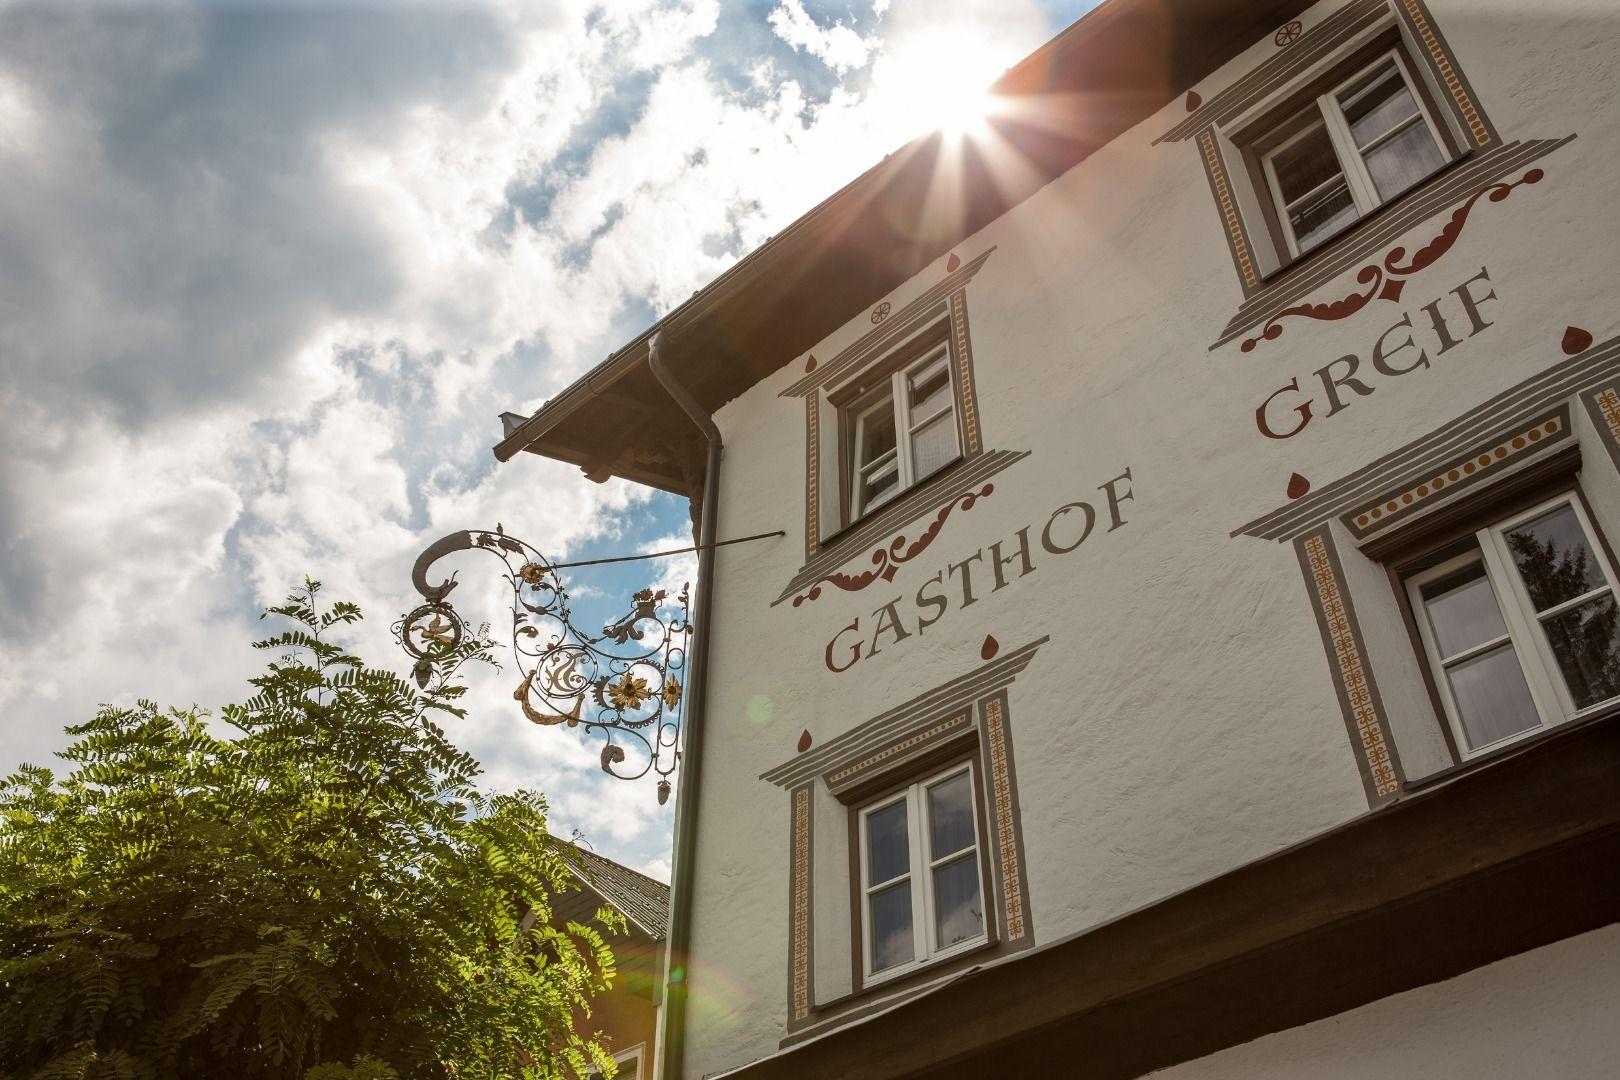 Gasthof Greif